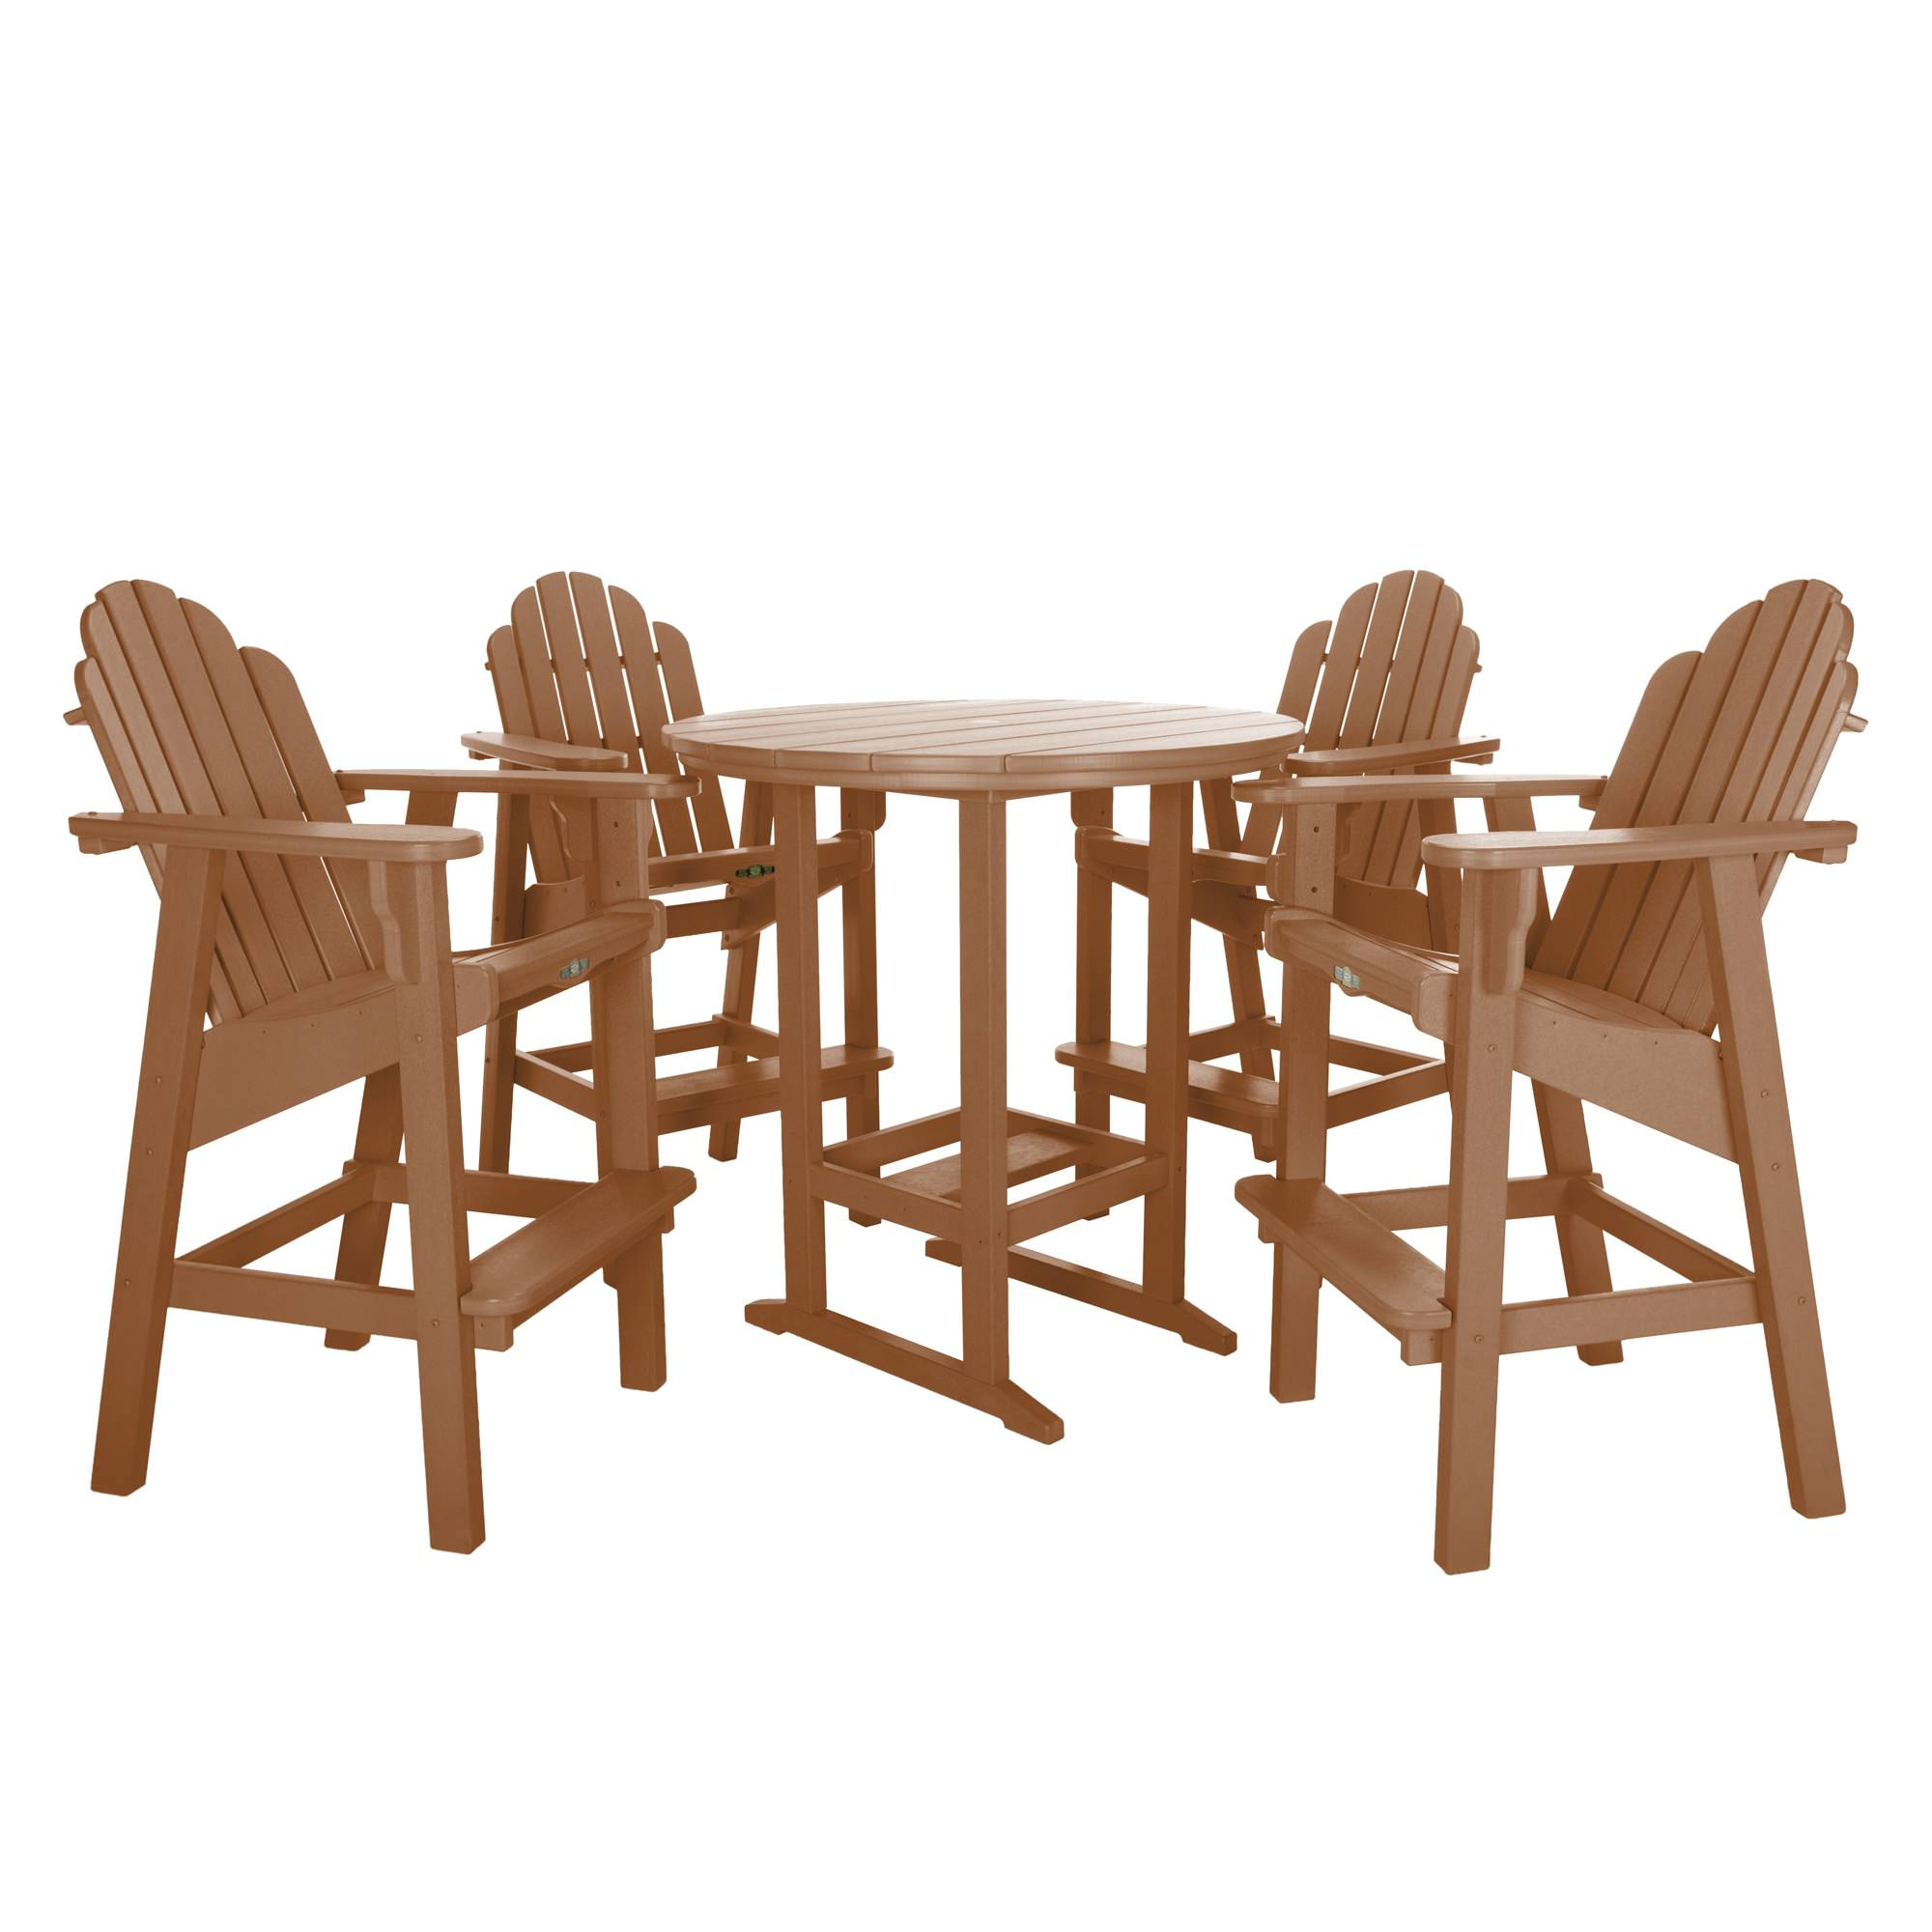 Pleasing Welcome To Pawleys Island Hammocks Andrewgaddart Wooden Chair Designs For Living Room Andrewgaddartcom